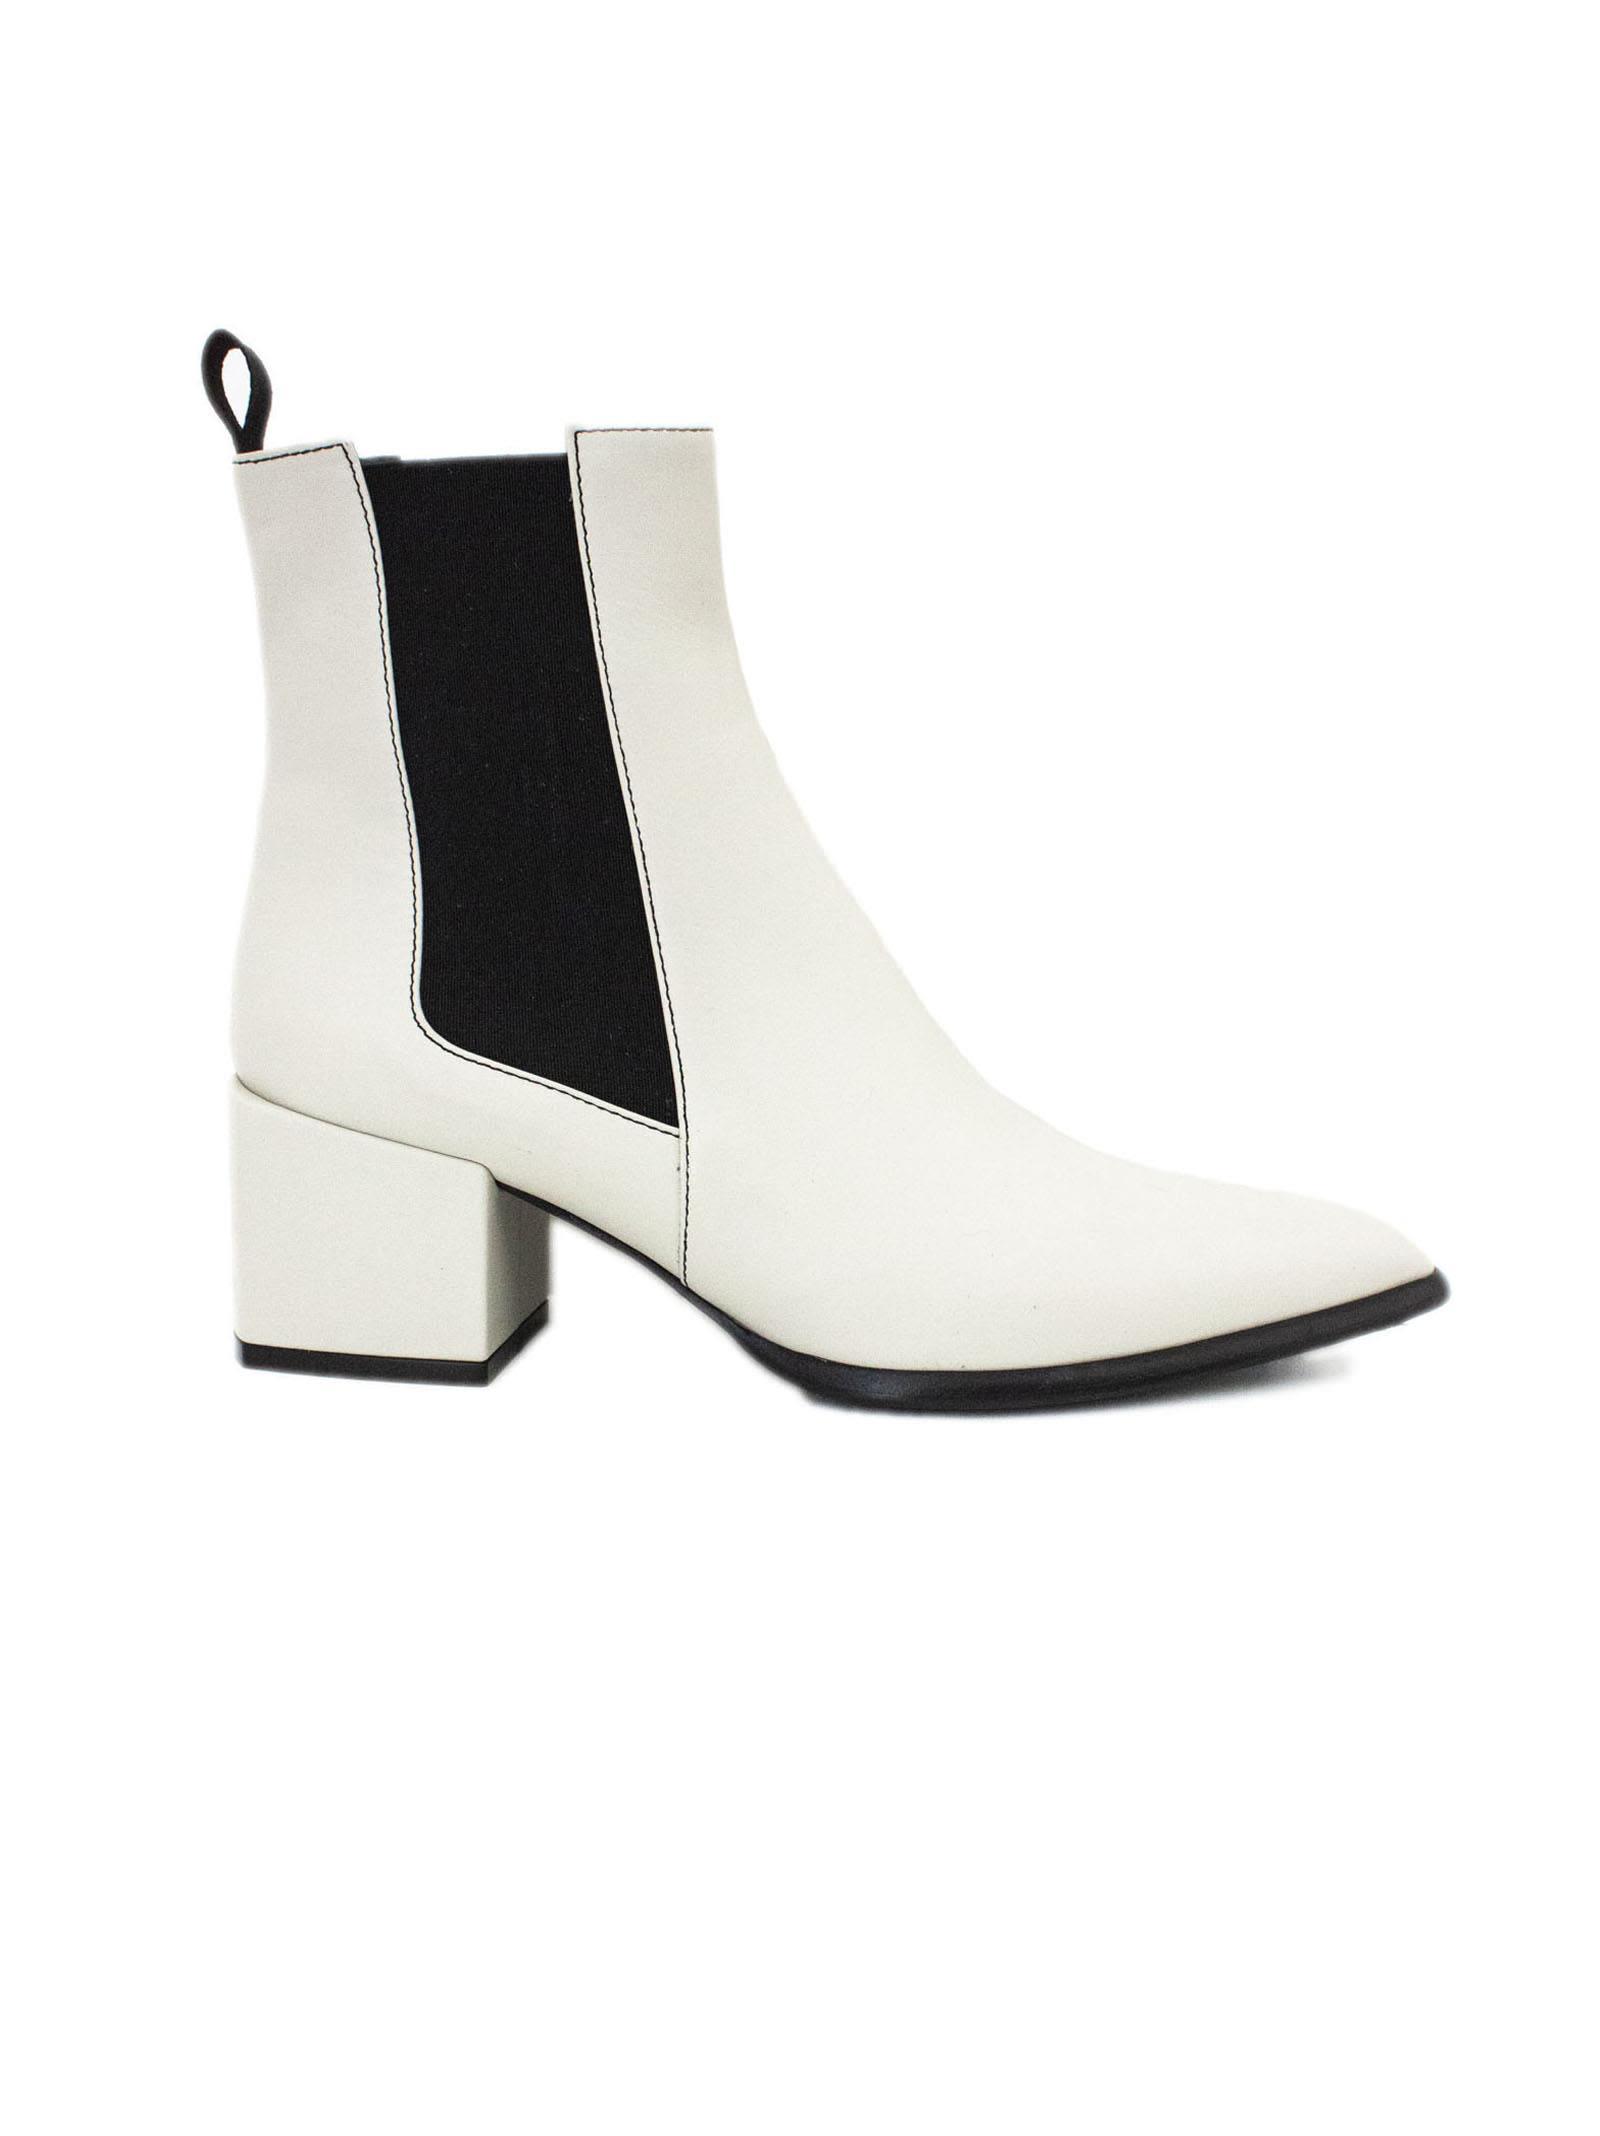 ROBERTO FESTA Rania Ankle Boot In White Leather. in Crema